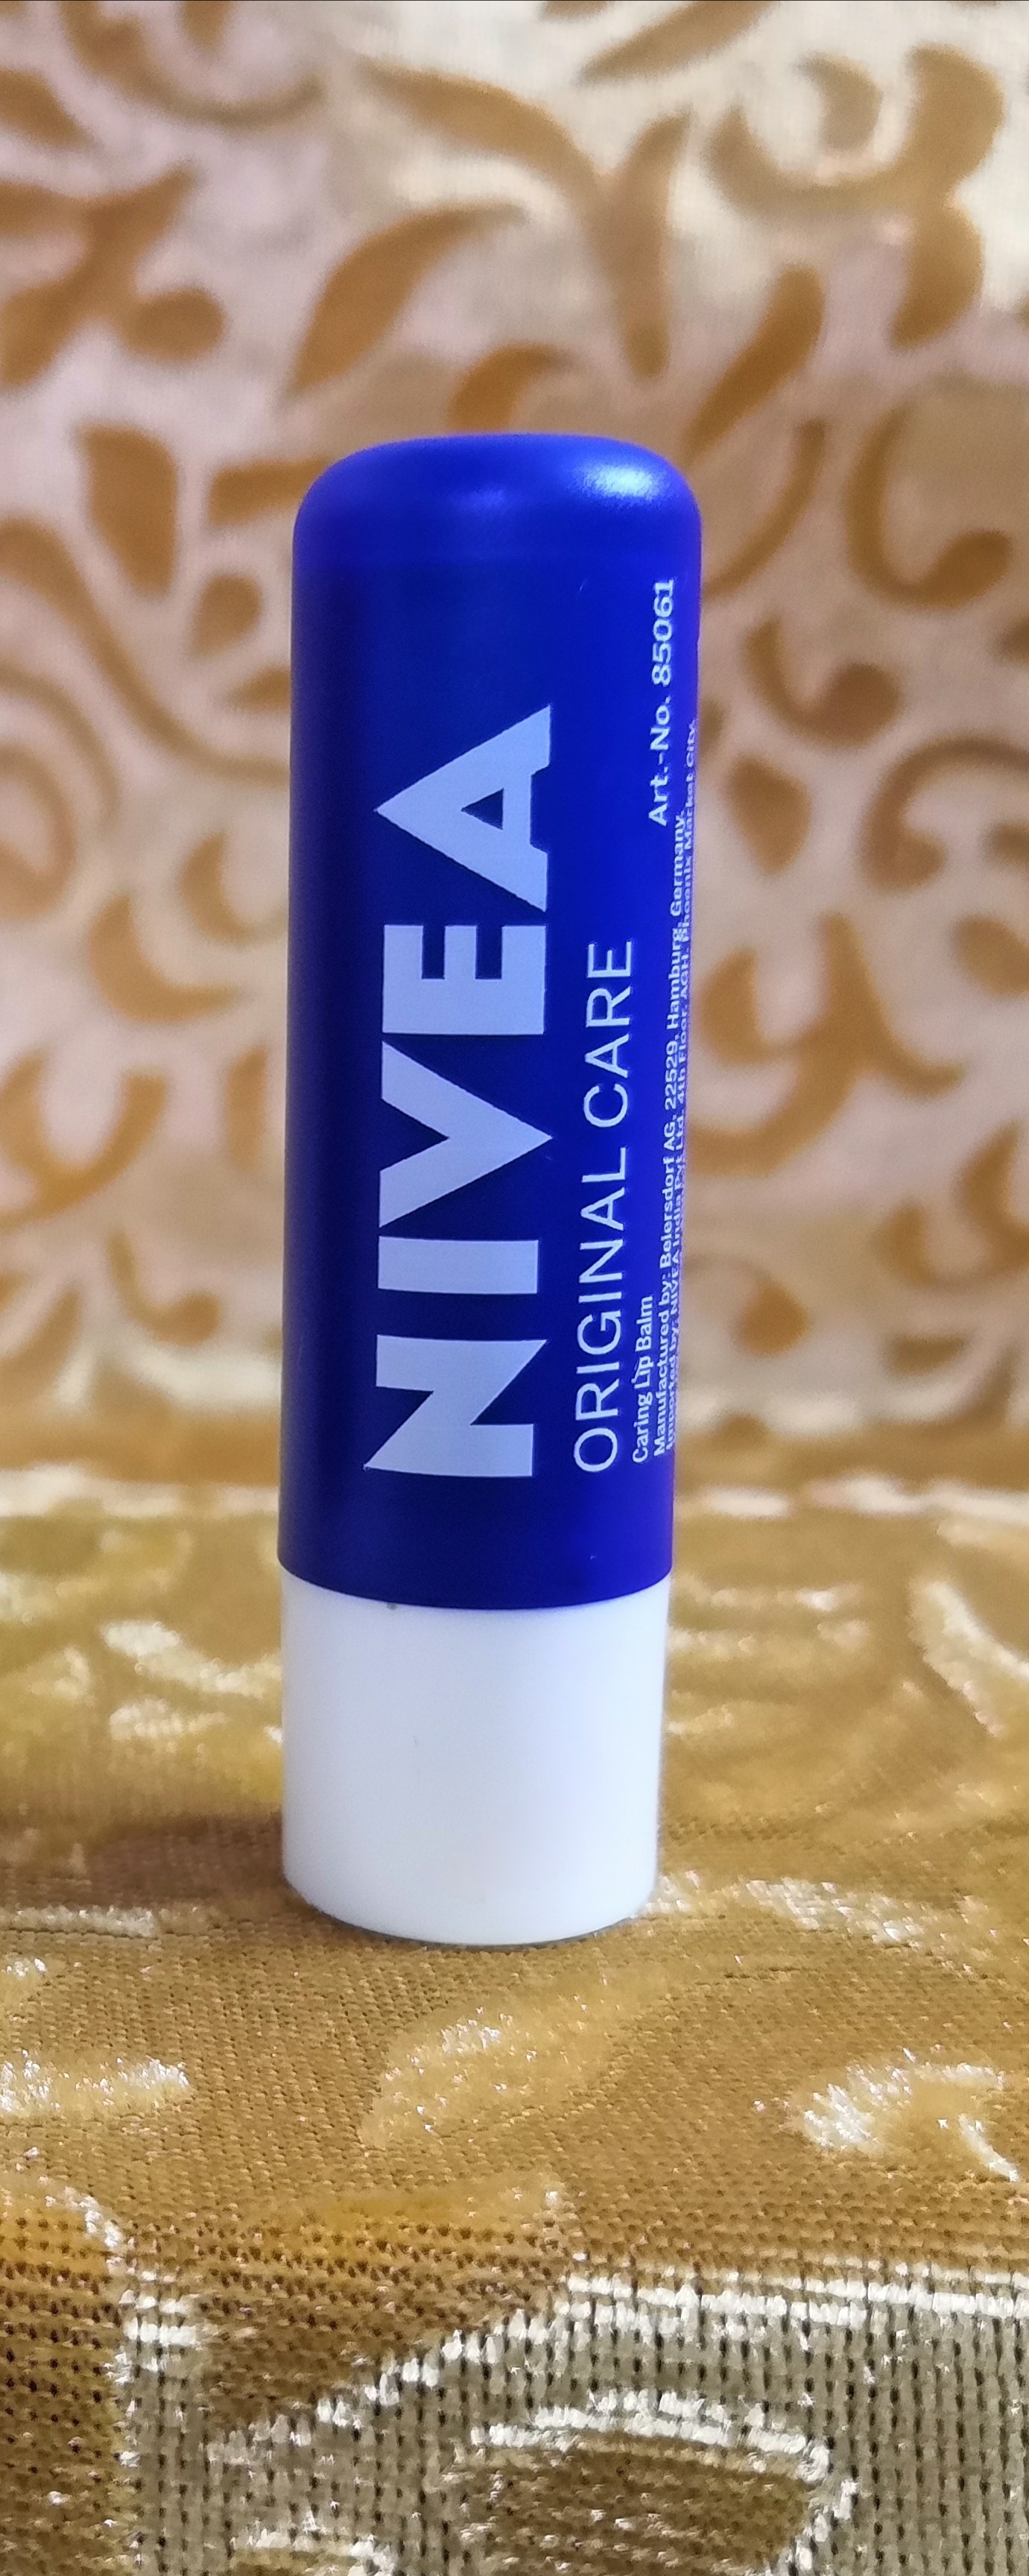 Nivea Original Care Lip Balm-Most nourishing lip balm-By stylefitjanu